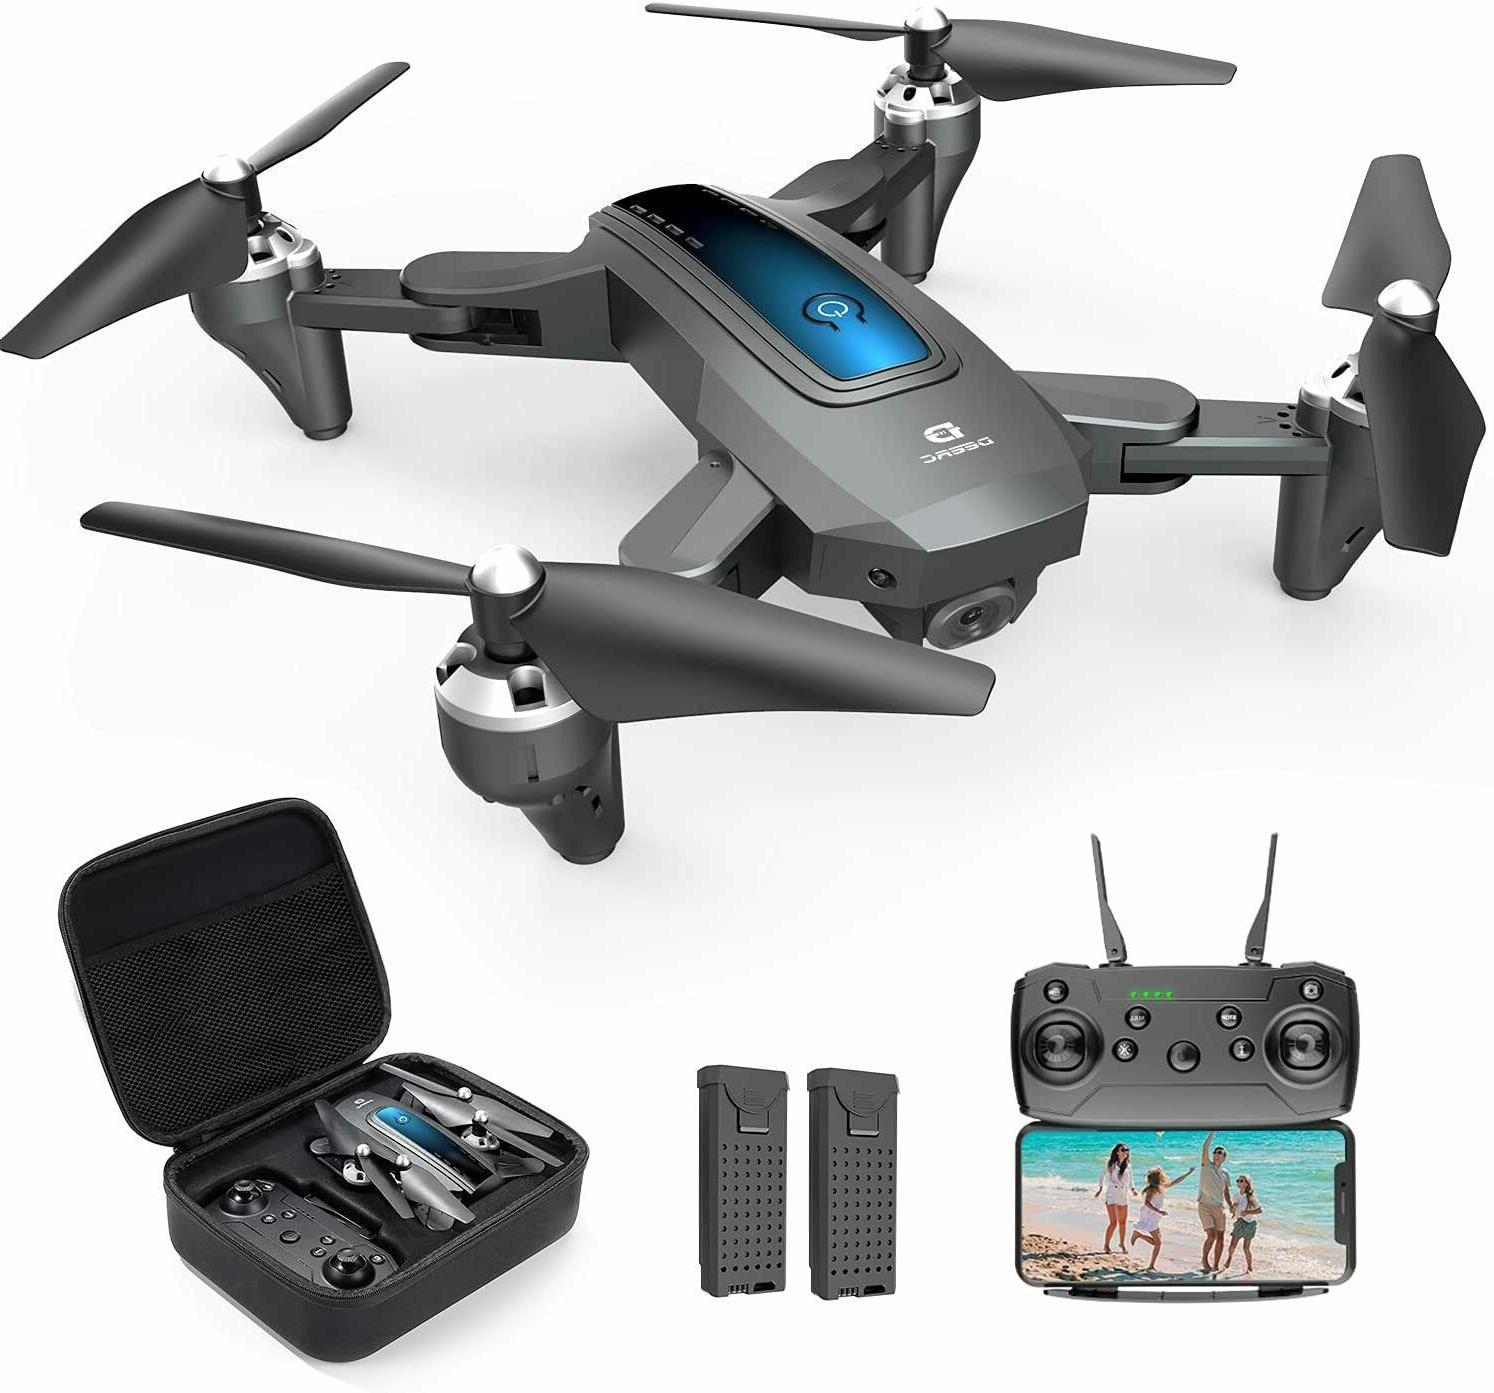 gps drone with hd camera wifi fpv